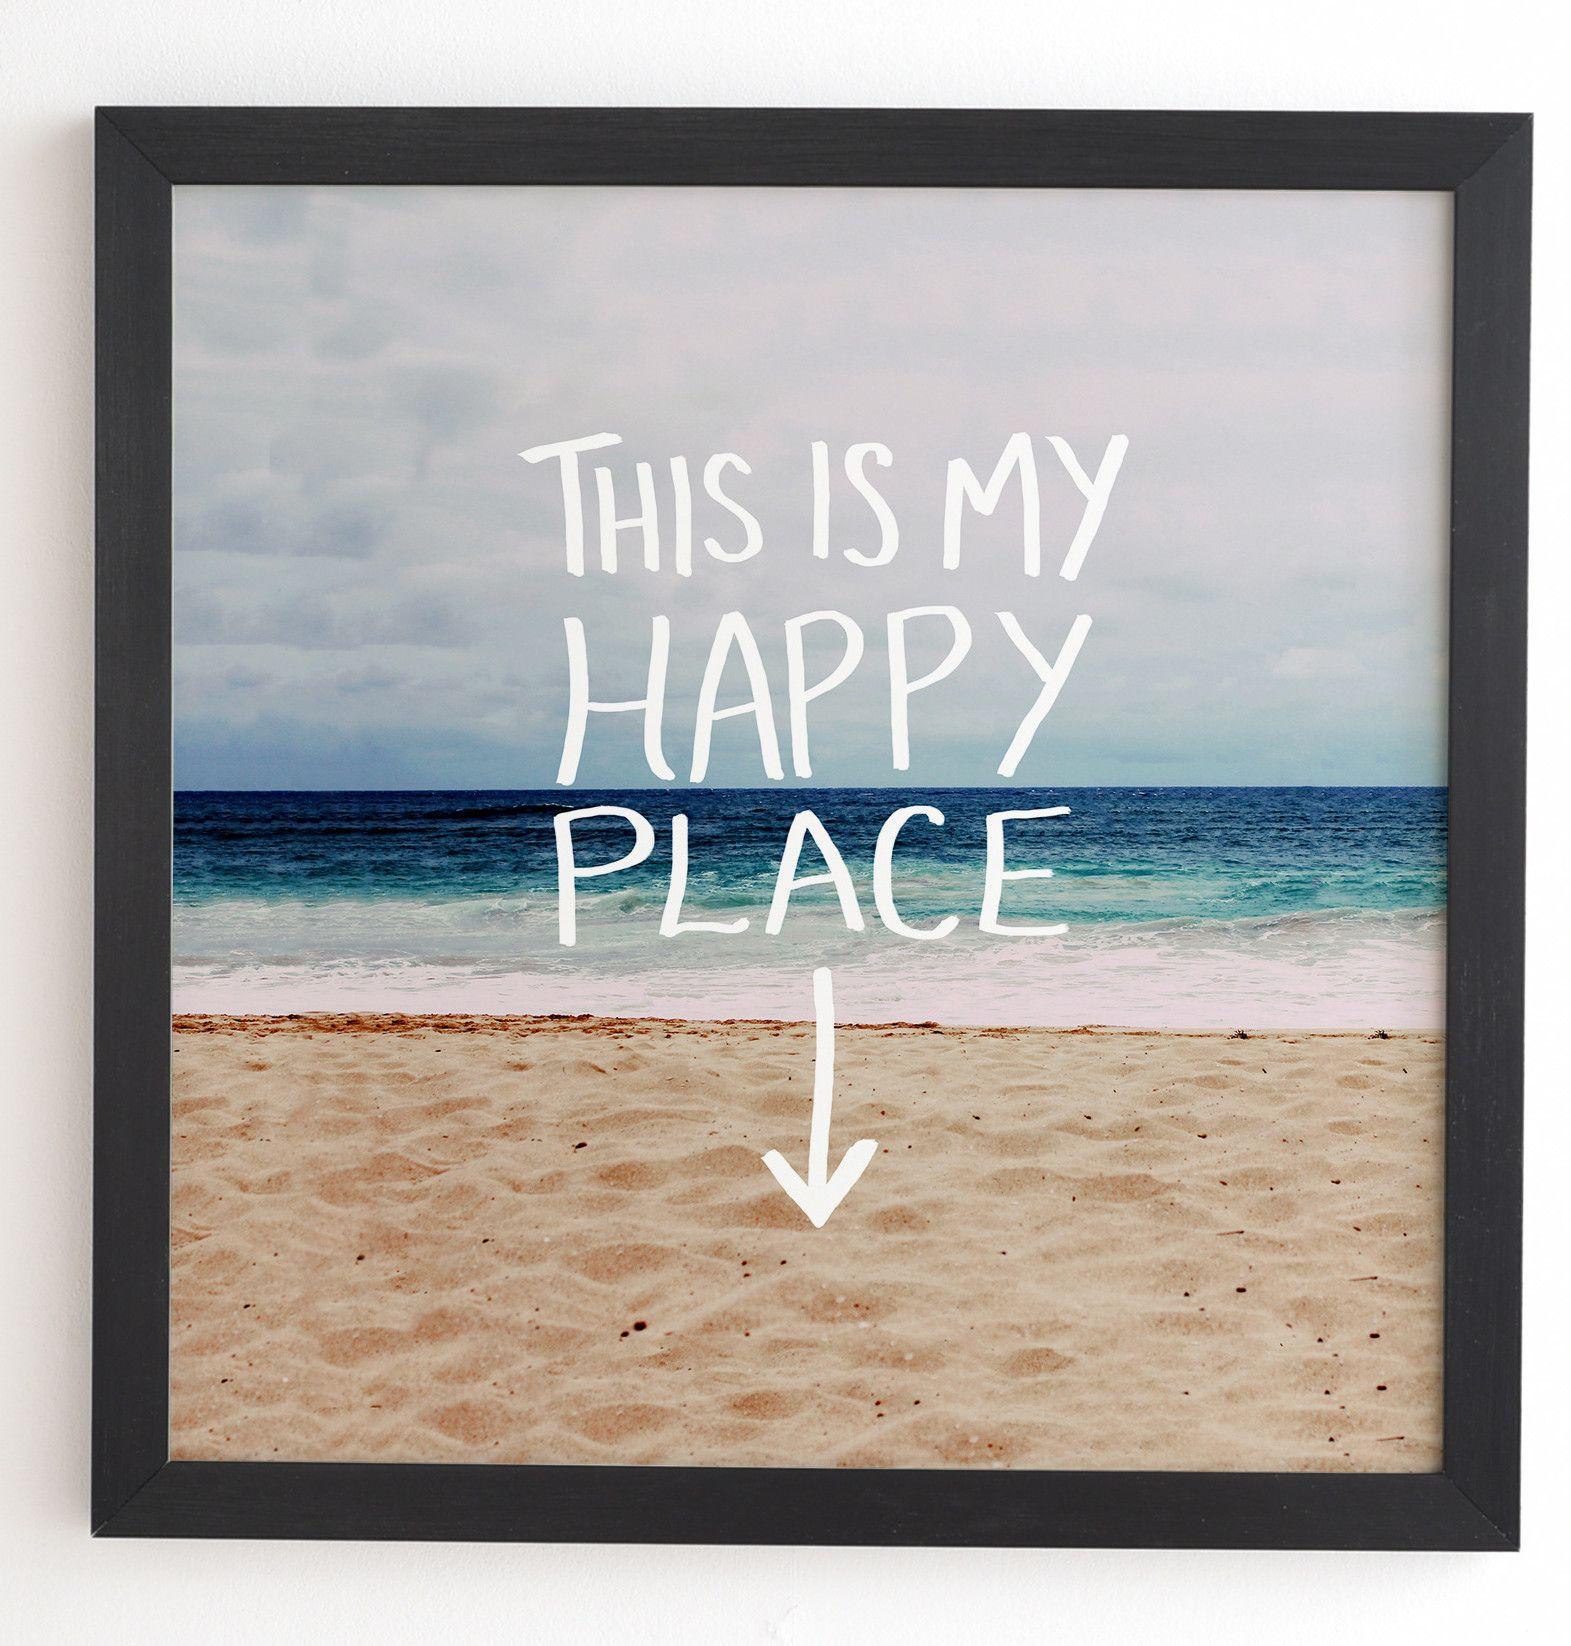 Happy Place X Beach Framed Textual Art Beach Frame Beach Wall